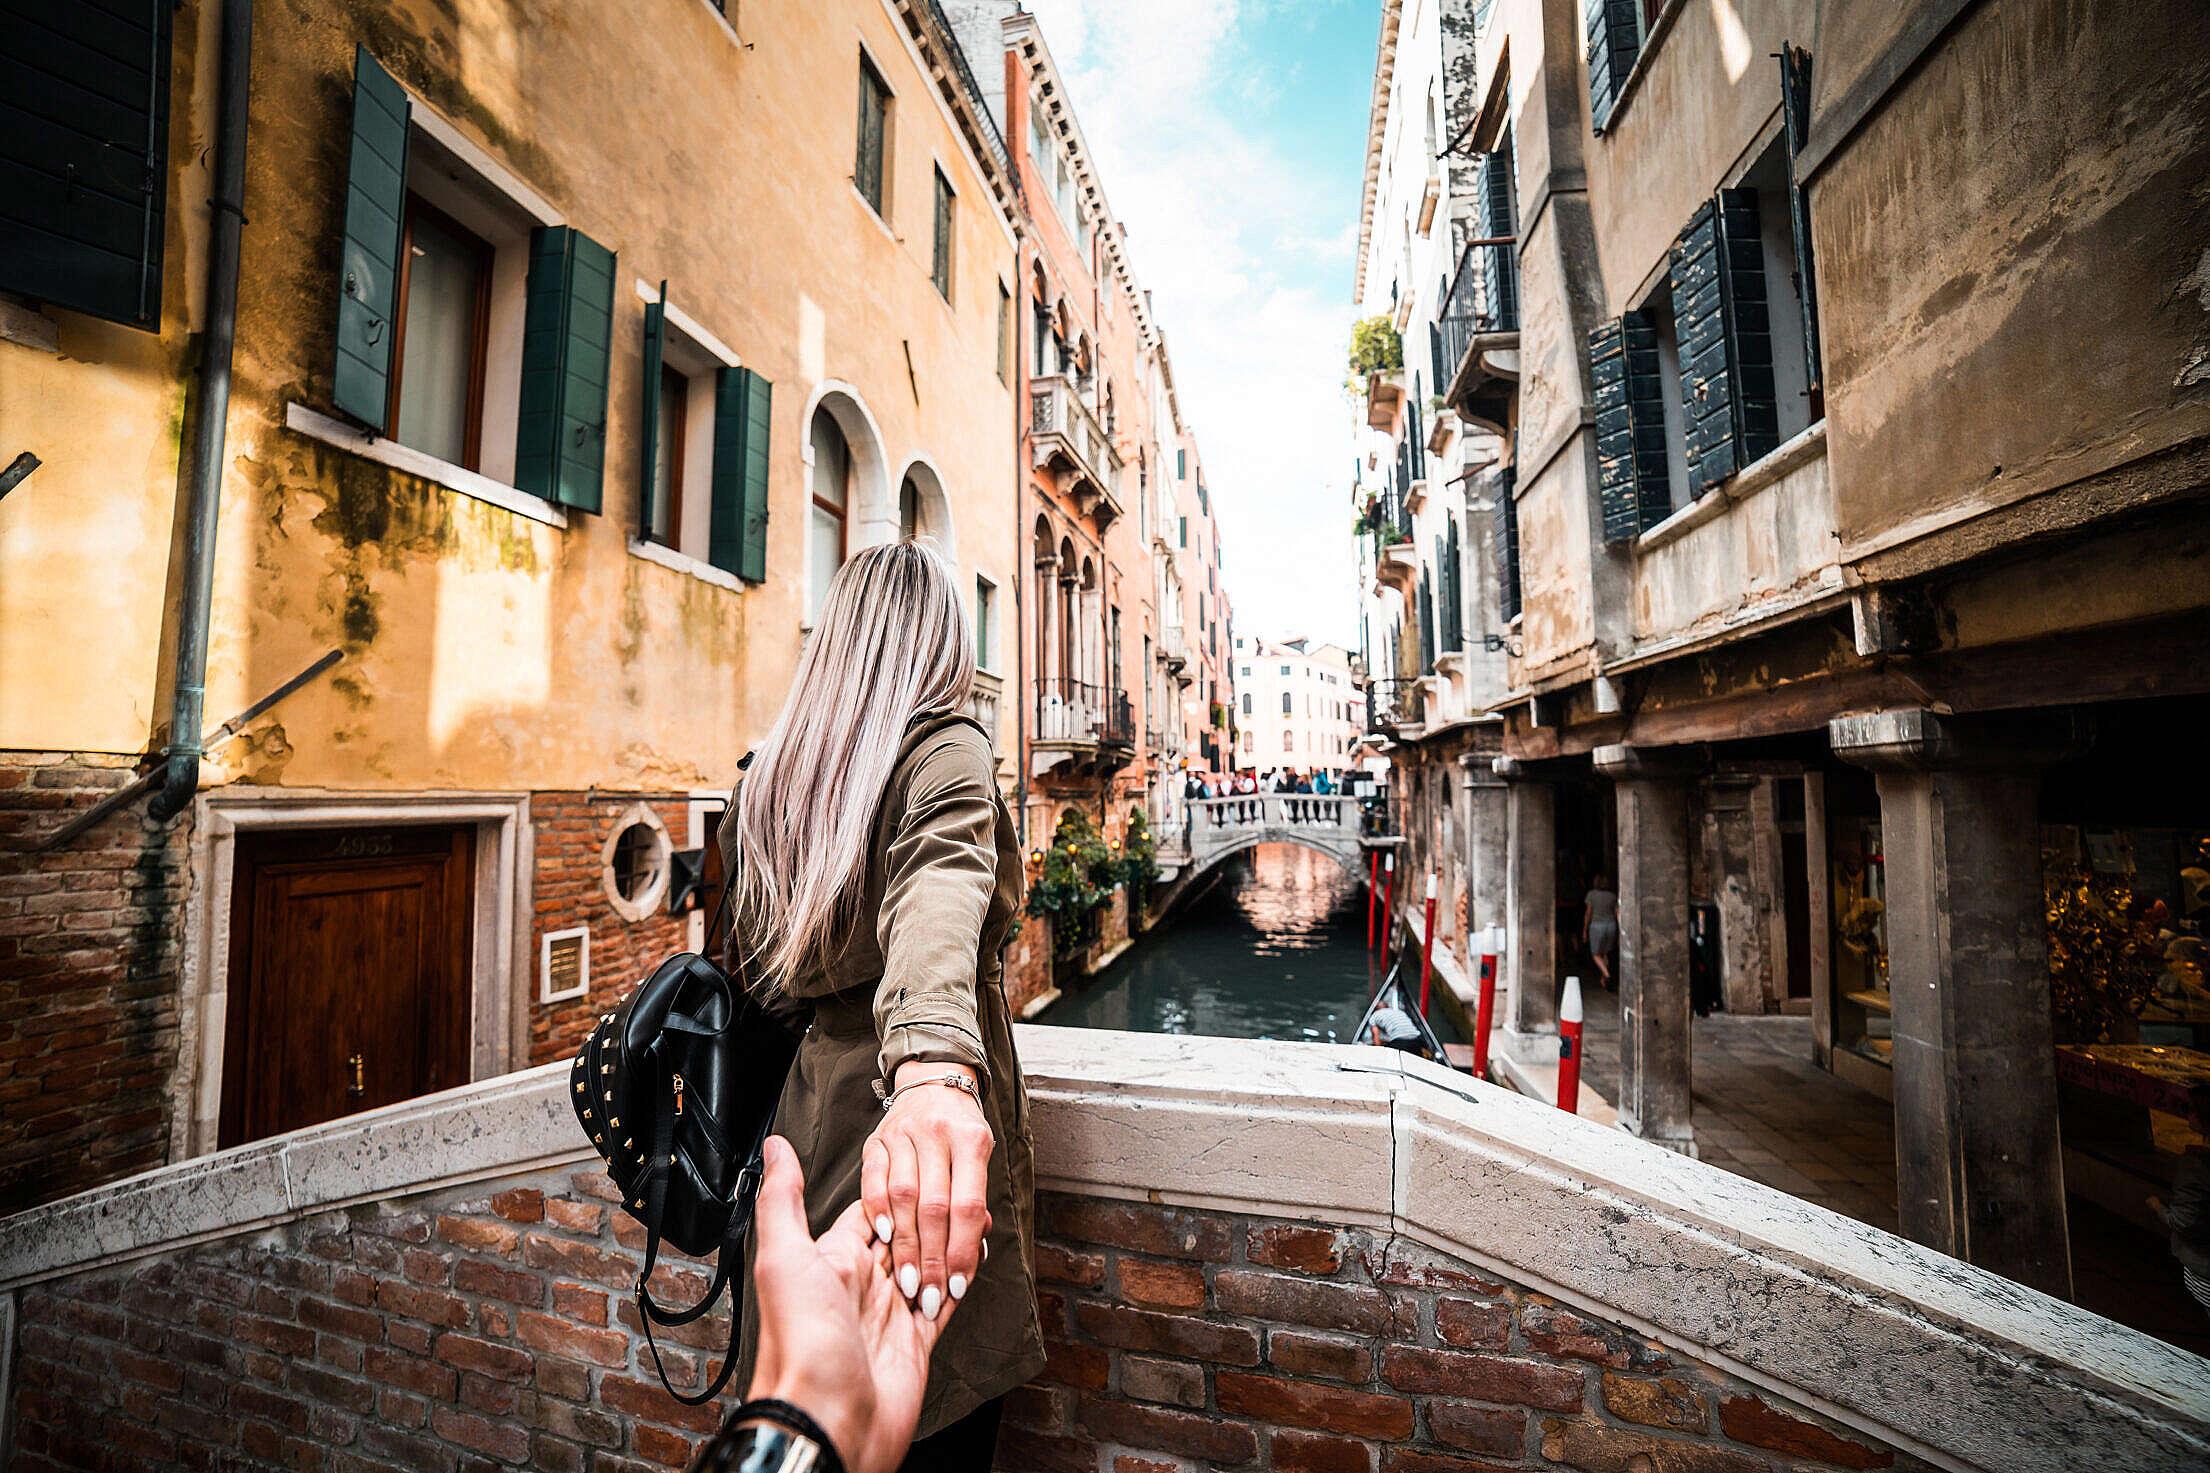 Couple in Venice, Italy Travel Free Stock Photo